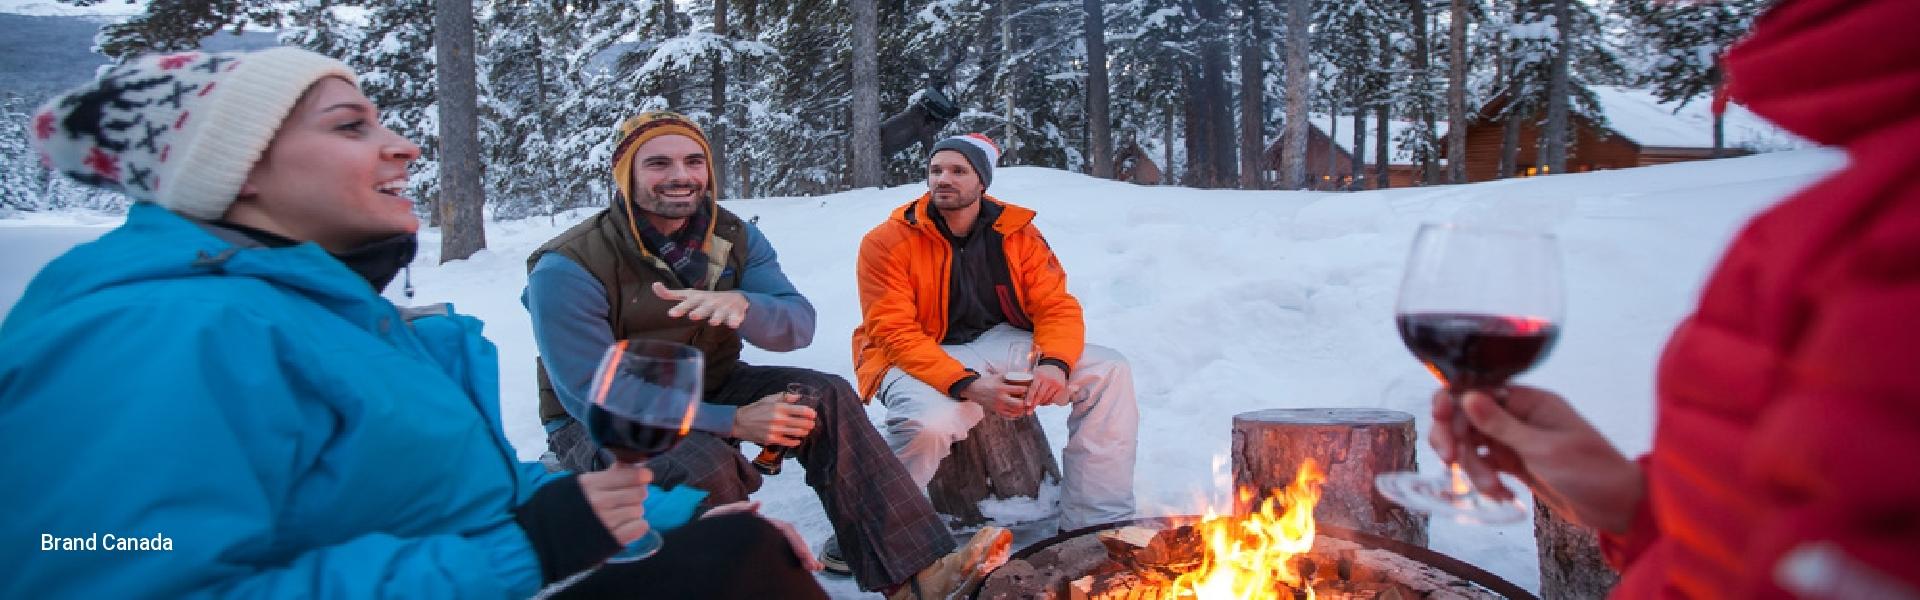 Quebec Winter Tours